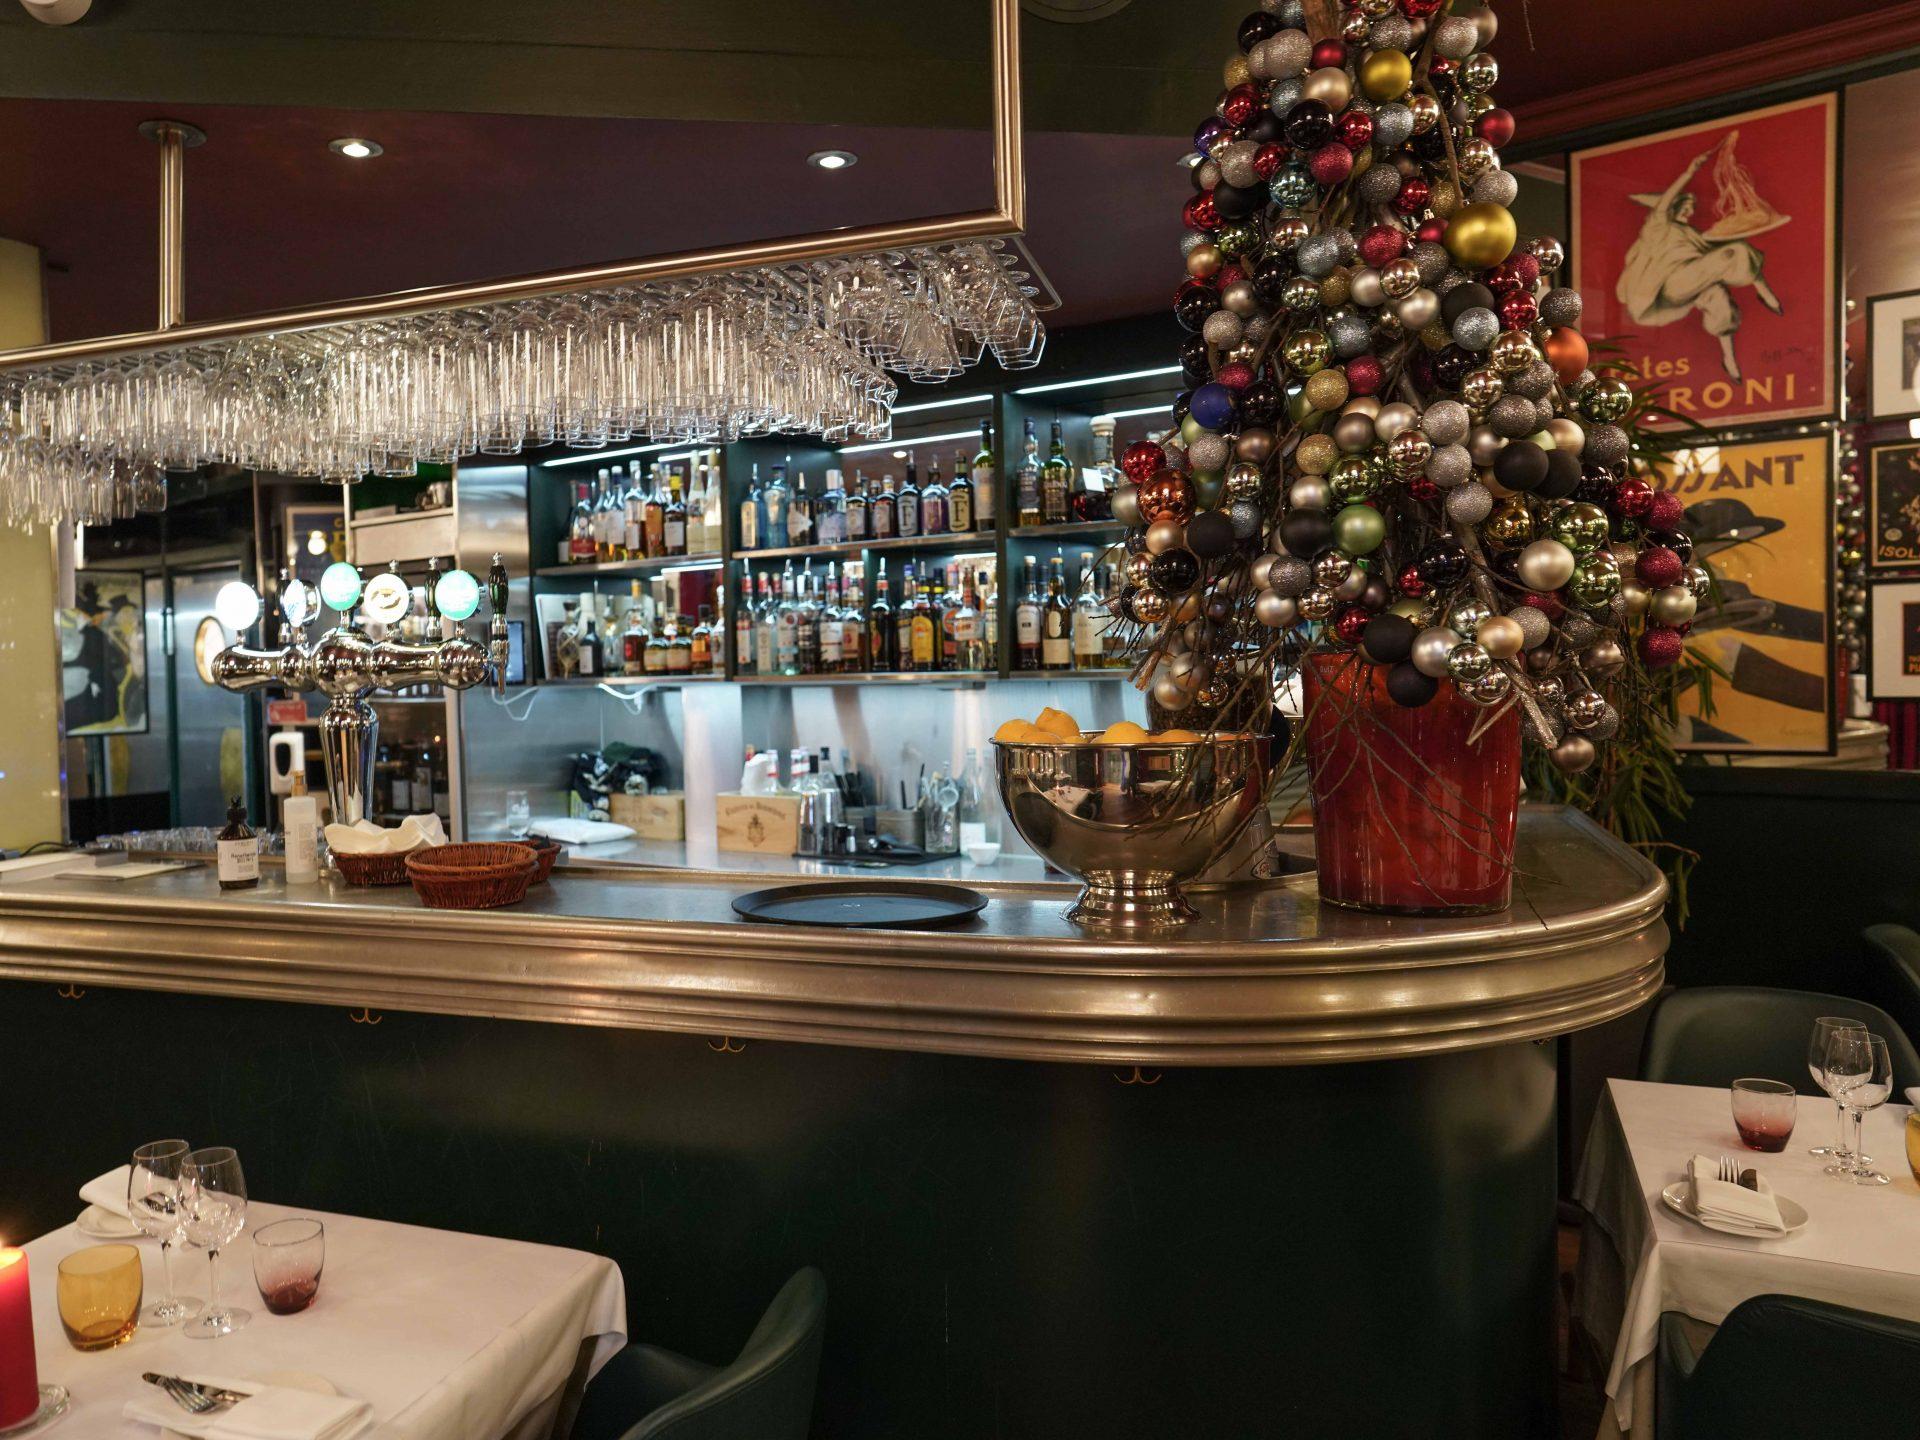 Carlton på Pustervig: Aarhus' smukkeste juleudsmykning